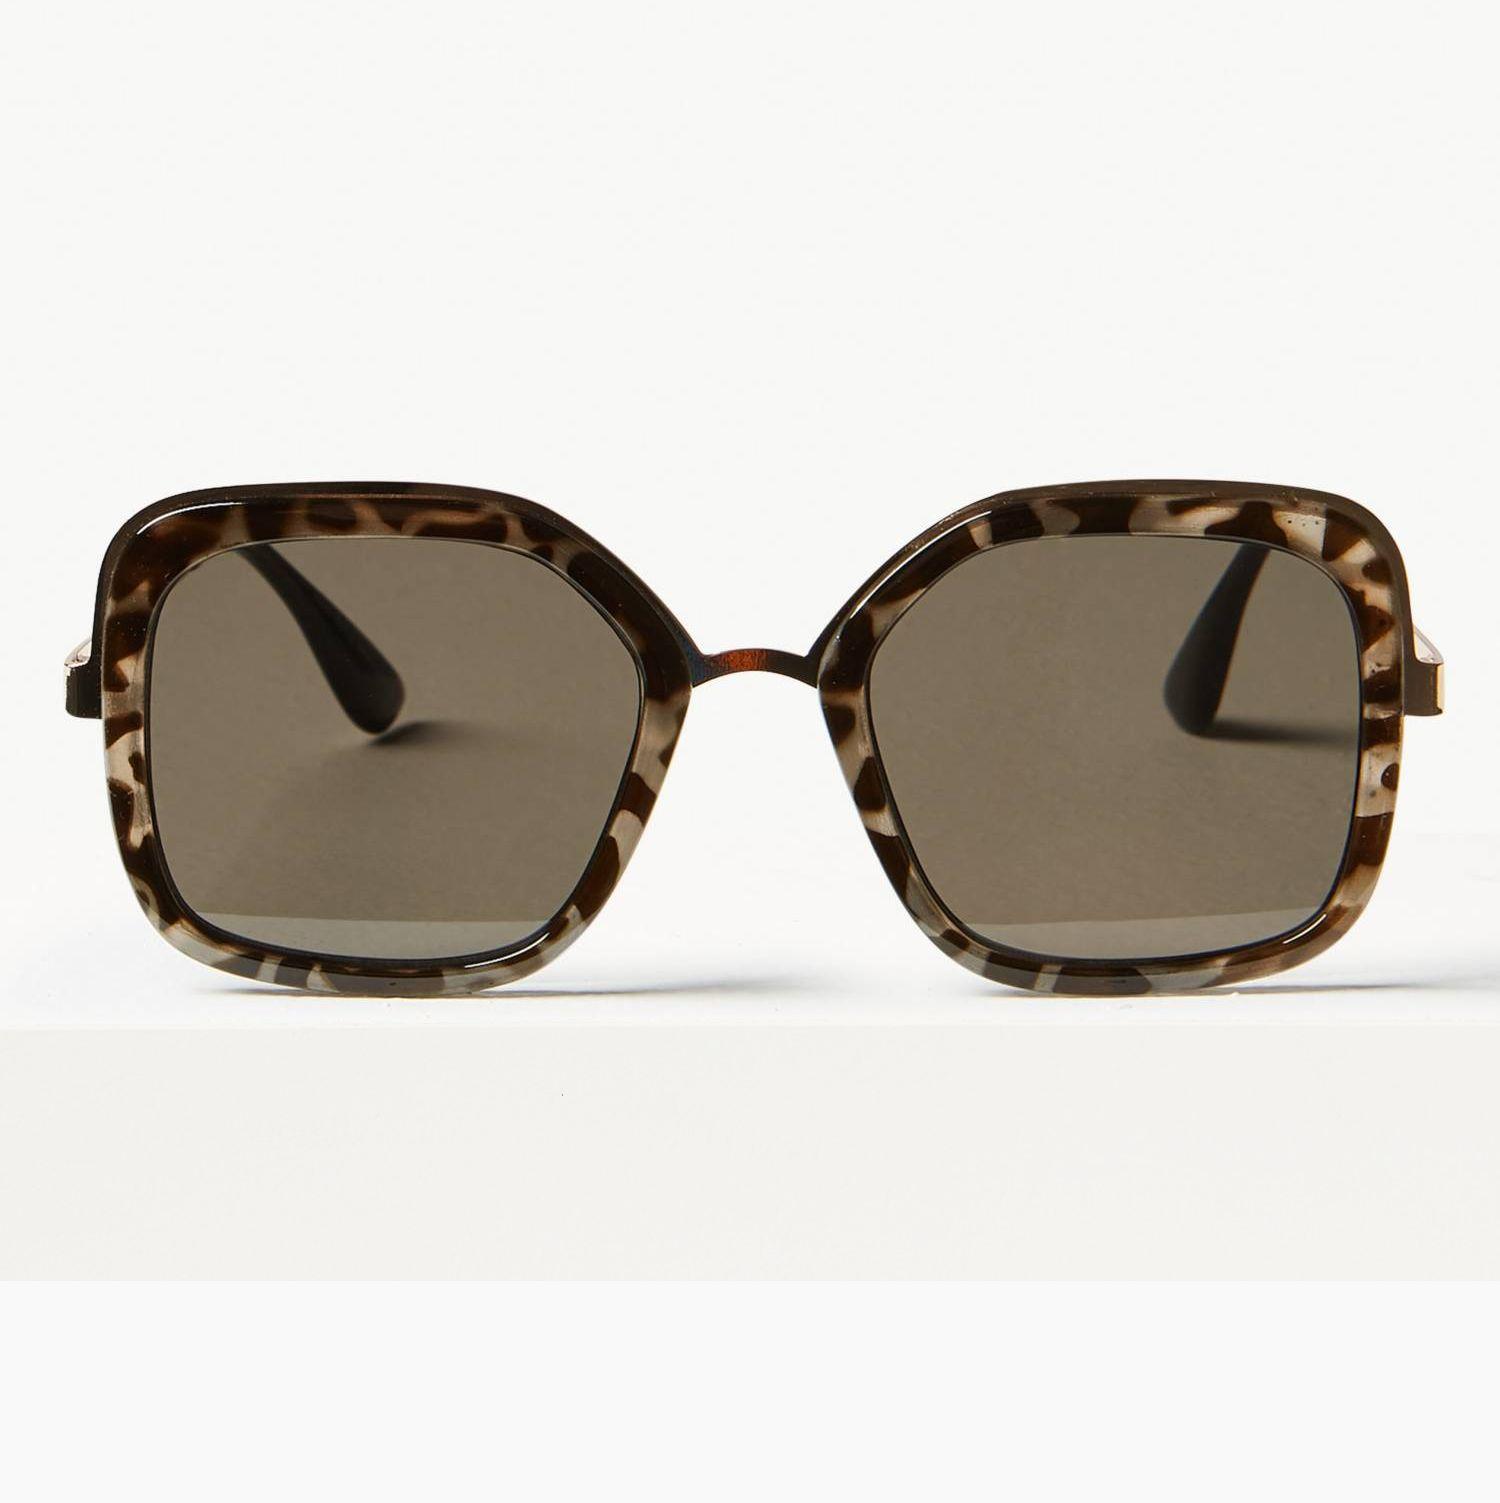 High street sunglasses